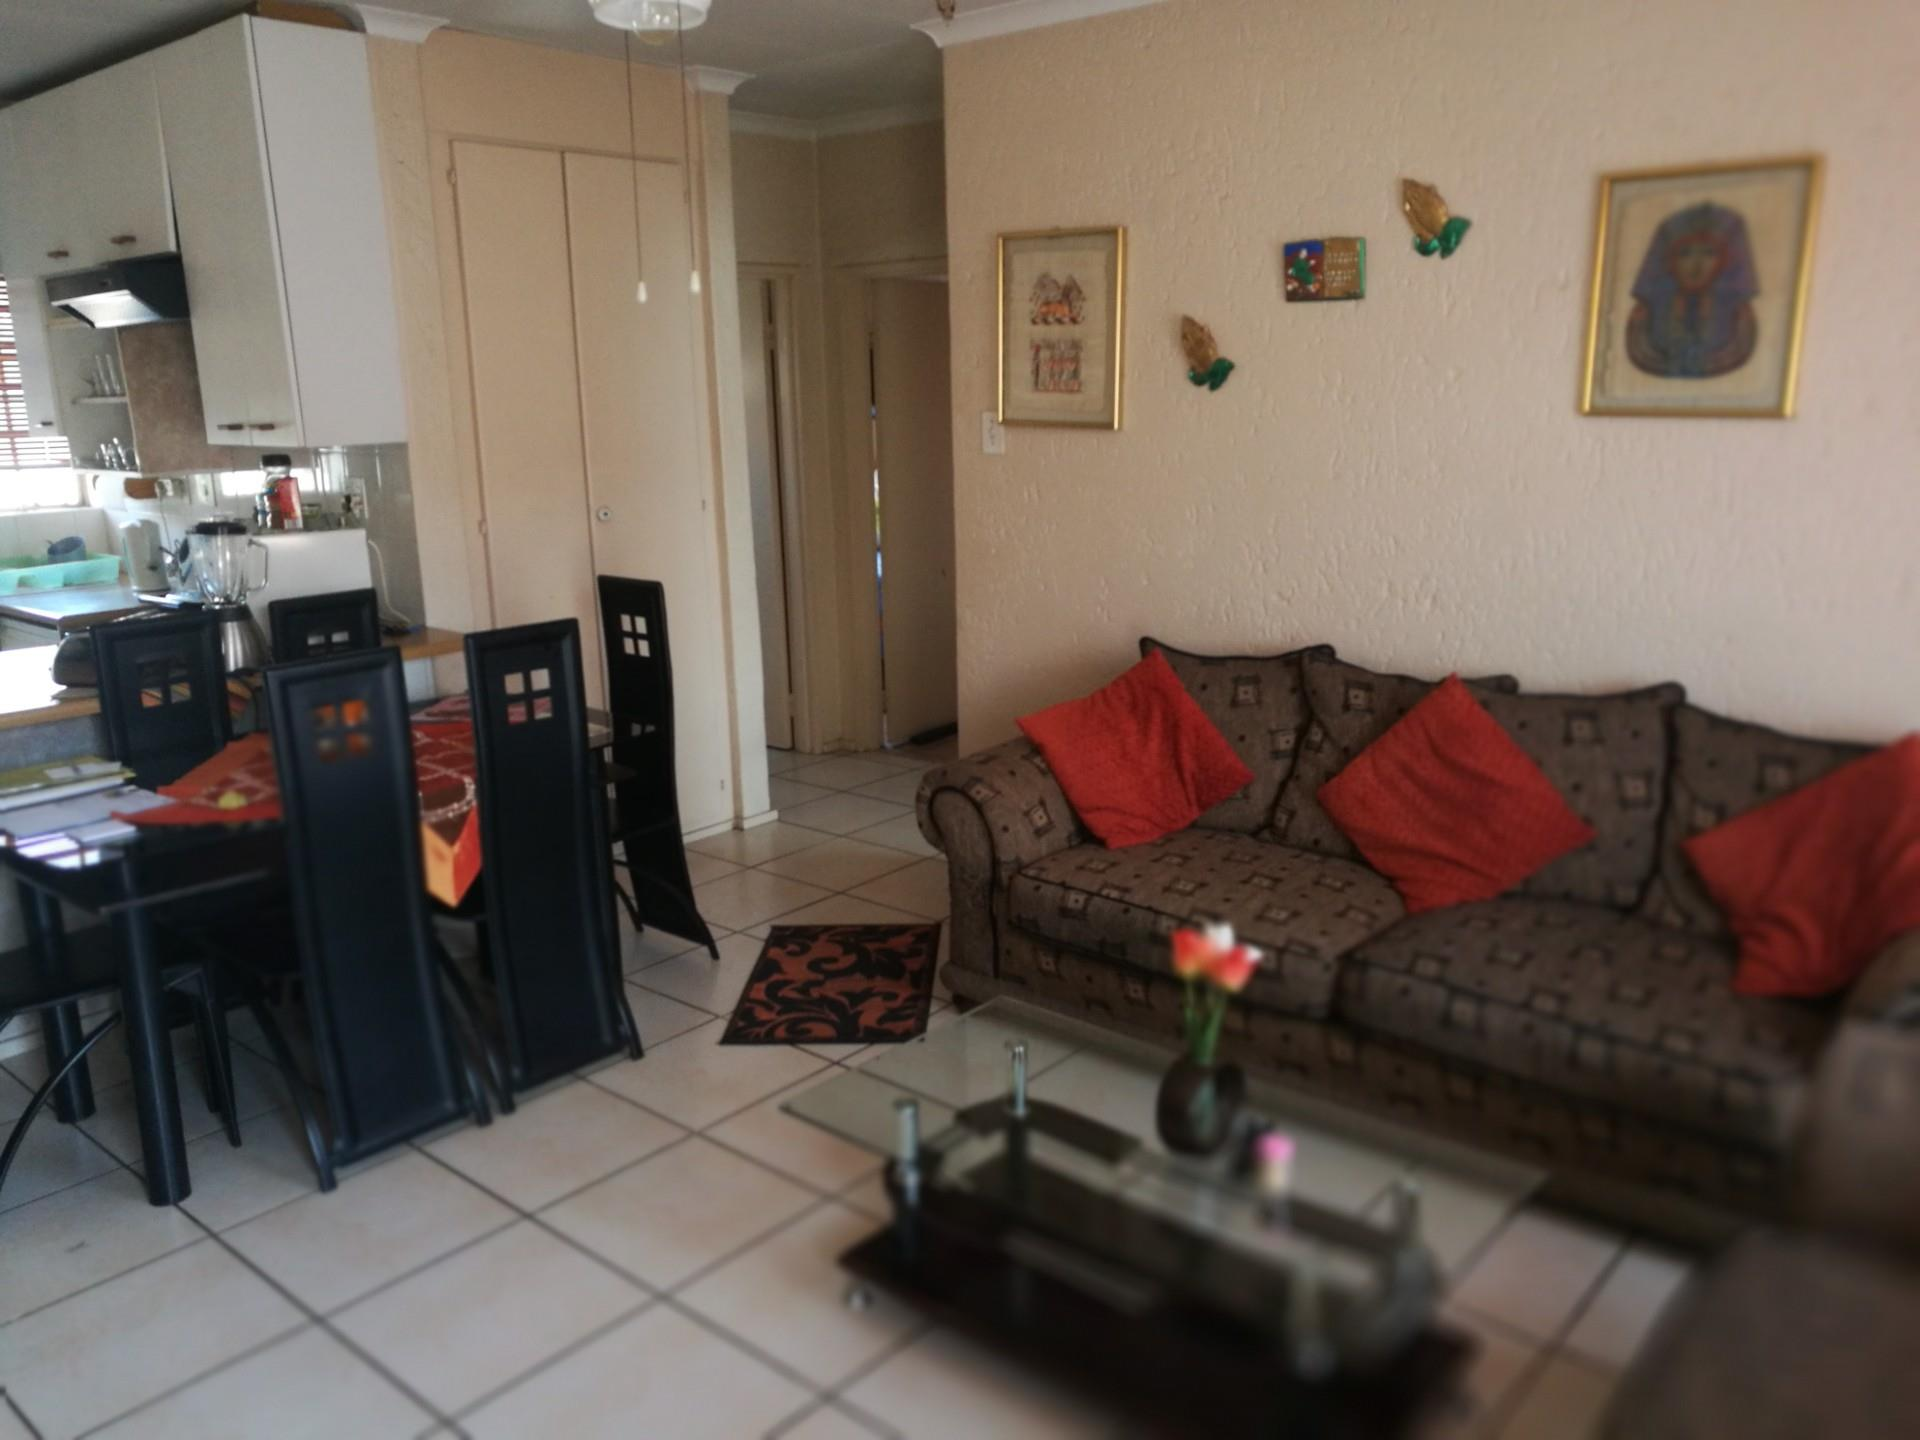 2 Bedroom Townhouse For Sale in Rewlatch